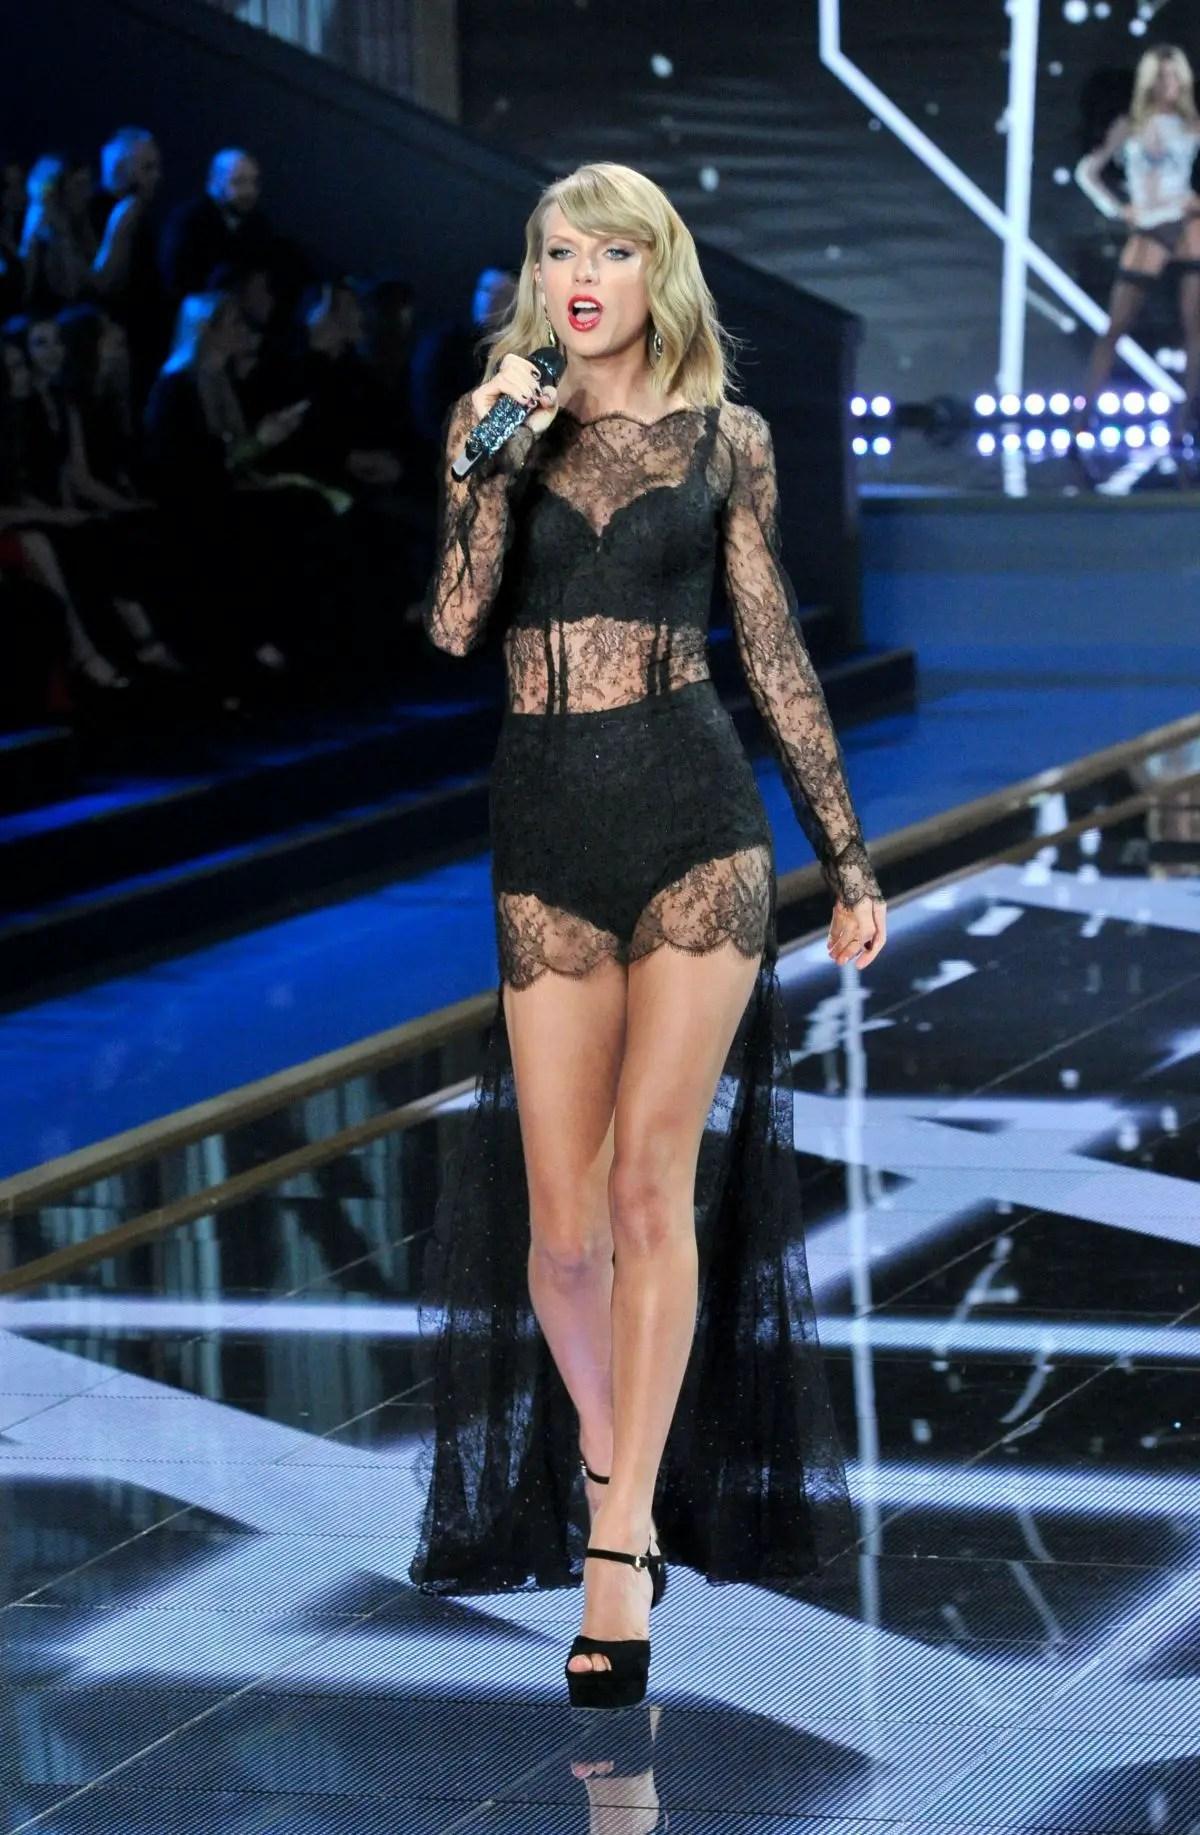 Taylor swift lingerie